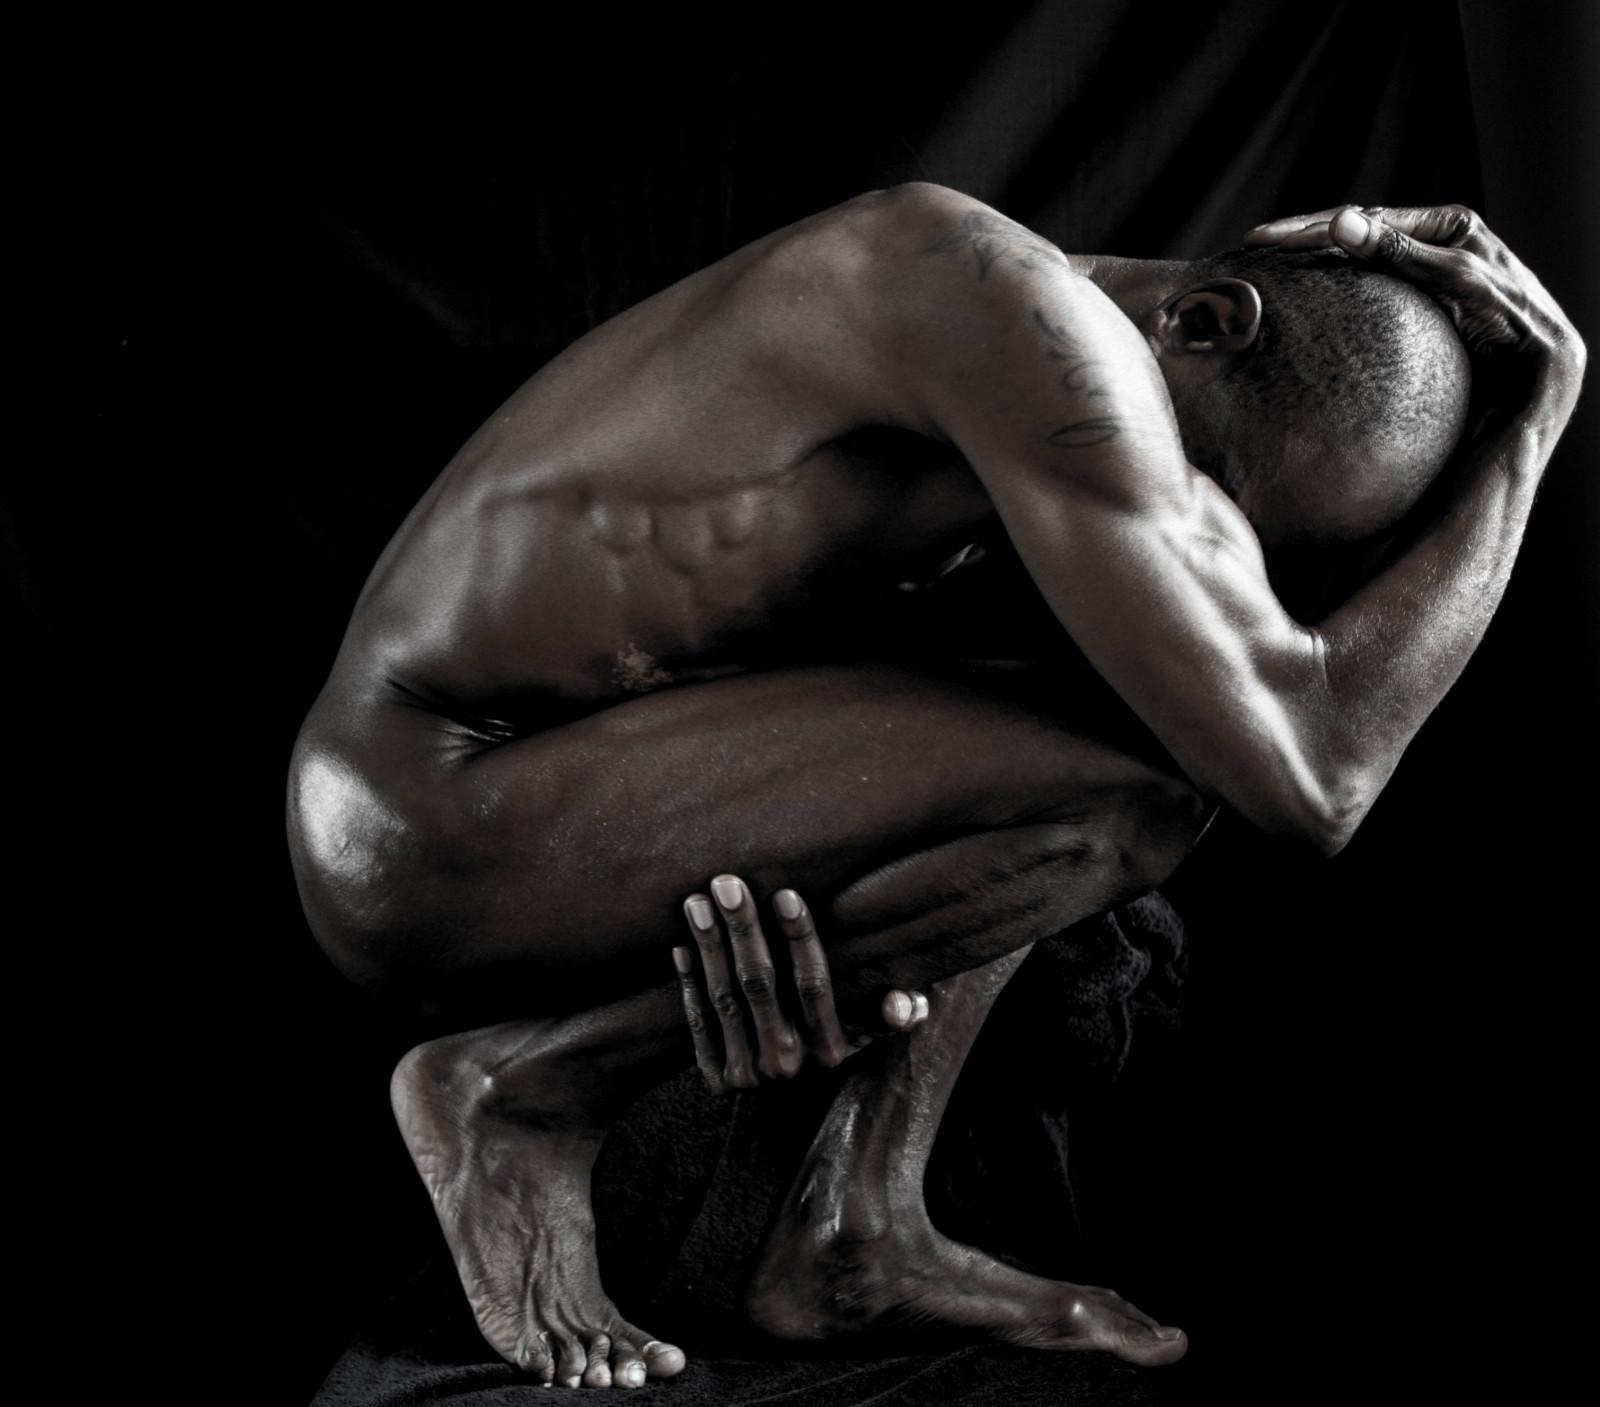 Wallpaper : actor, back, solo, dancer, bodybuilding, nude, flesh ... for Bodybuilding Art Photography  34eri